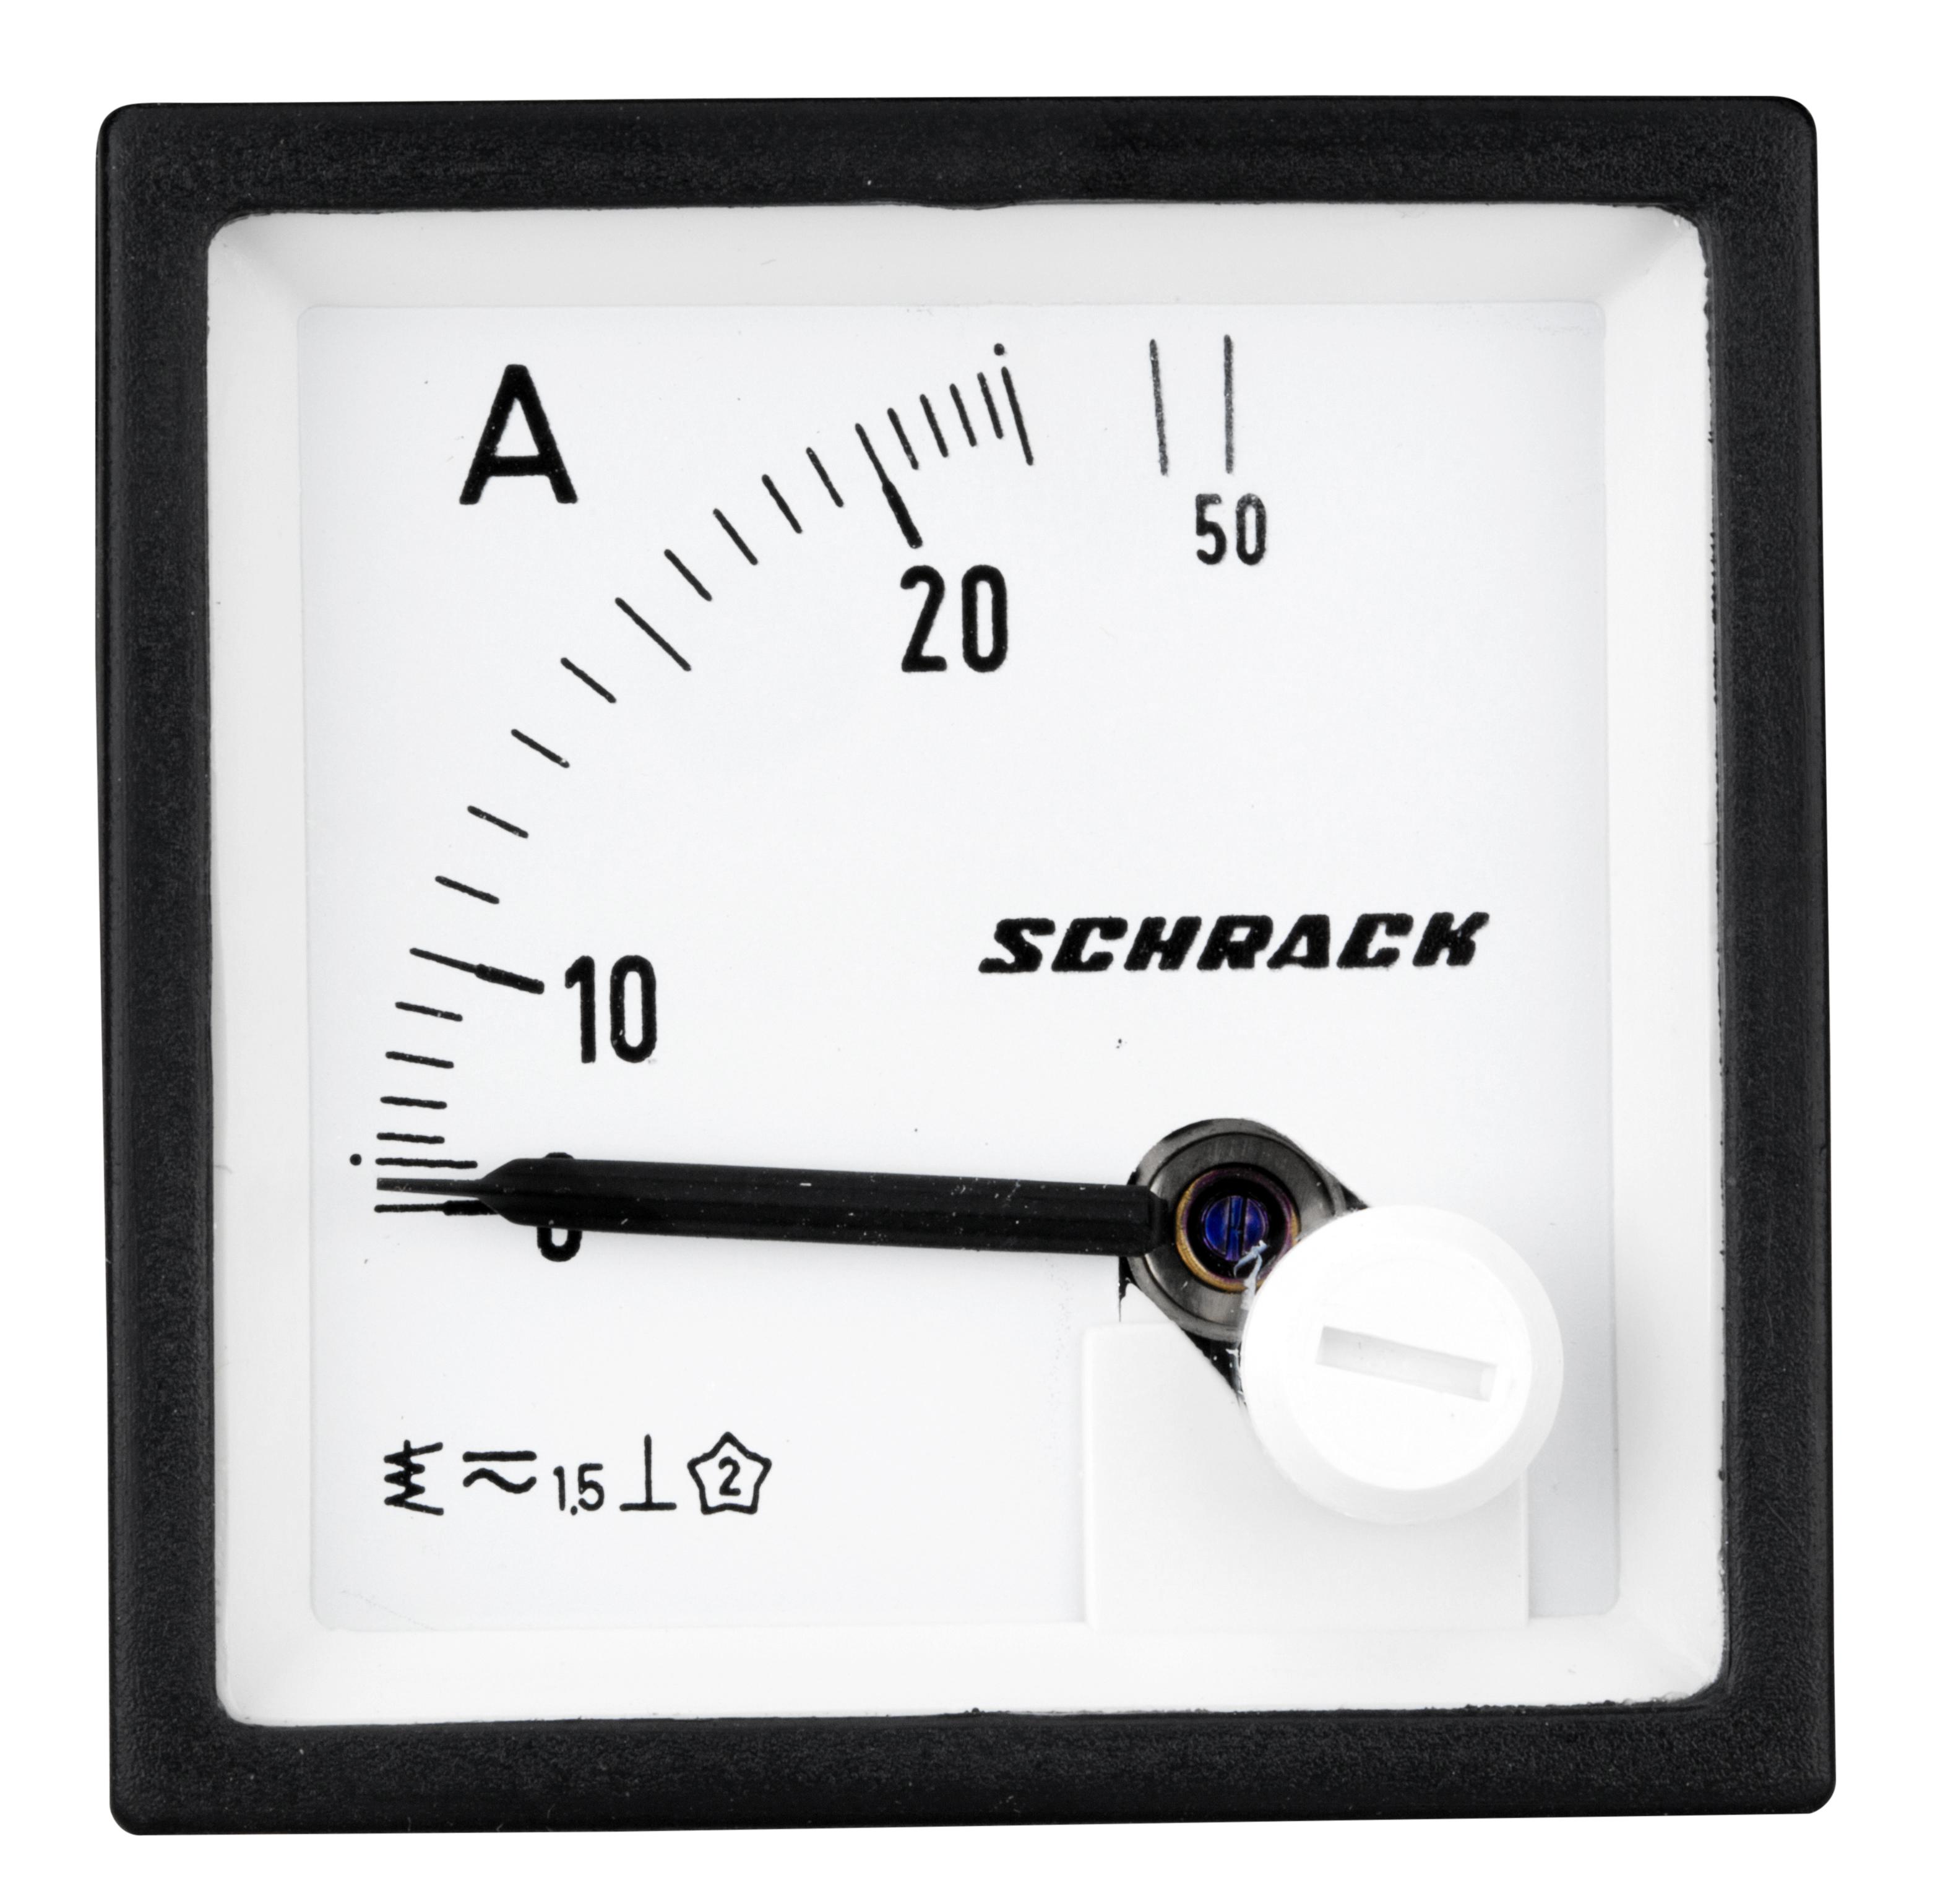 1 Stk Amperemeter, 48x48mm, 25A AC Direktmessung MGF54025-A